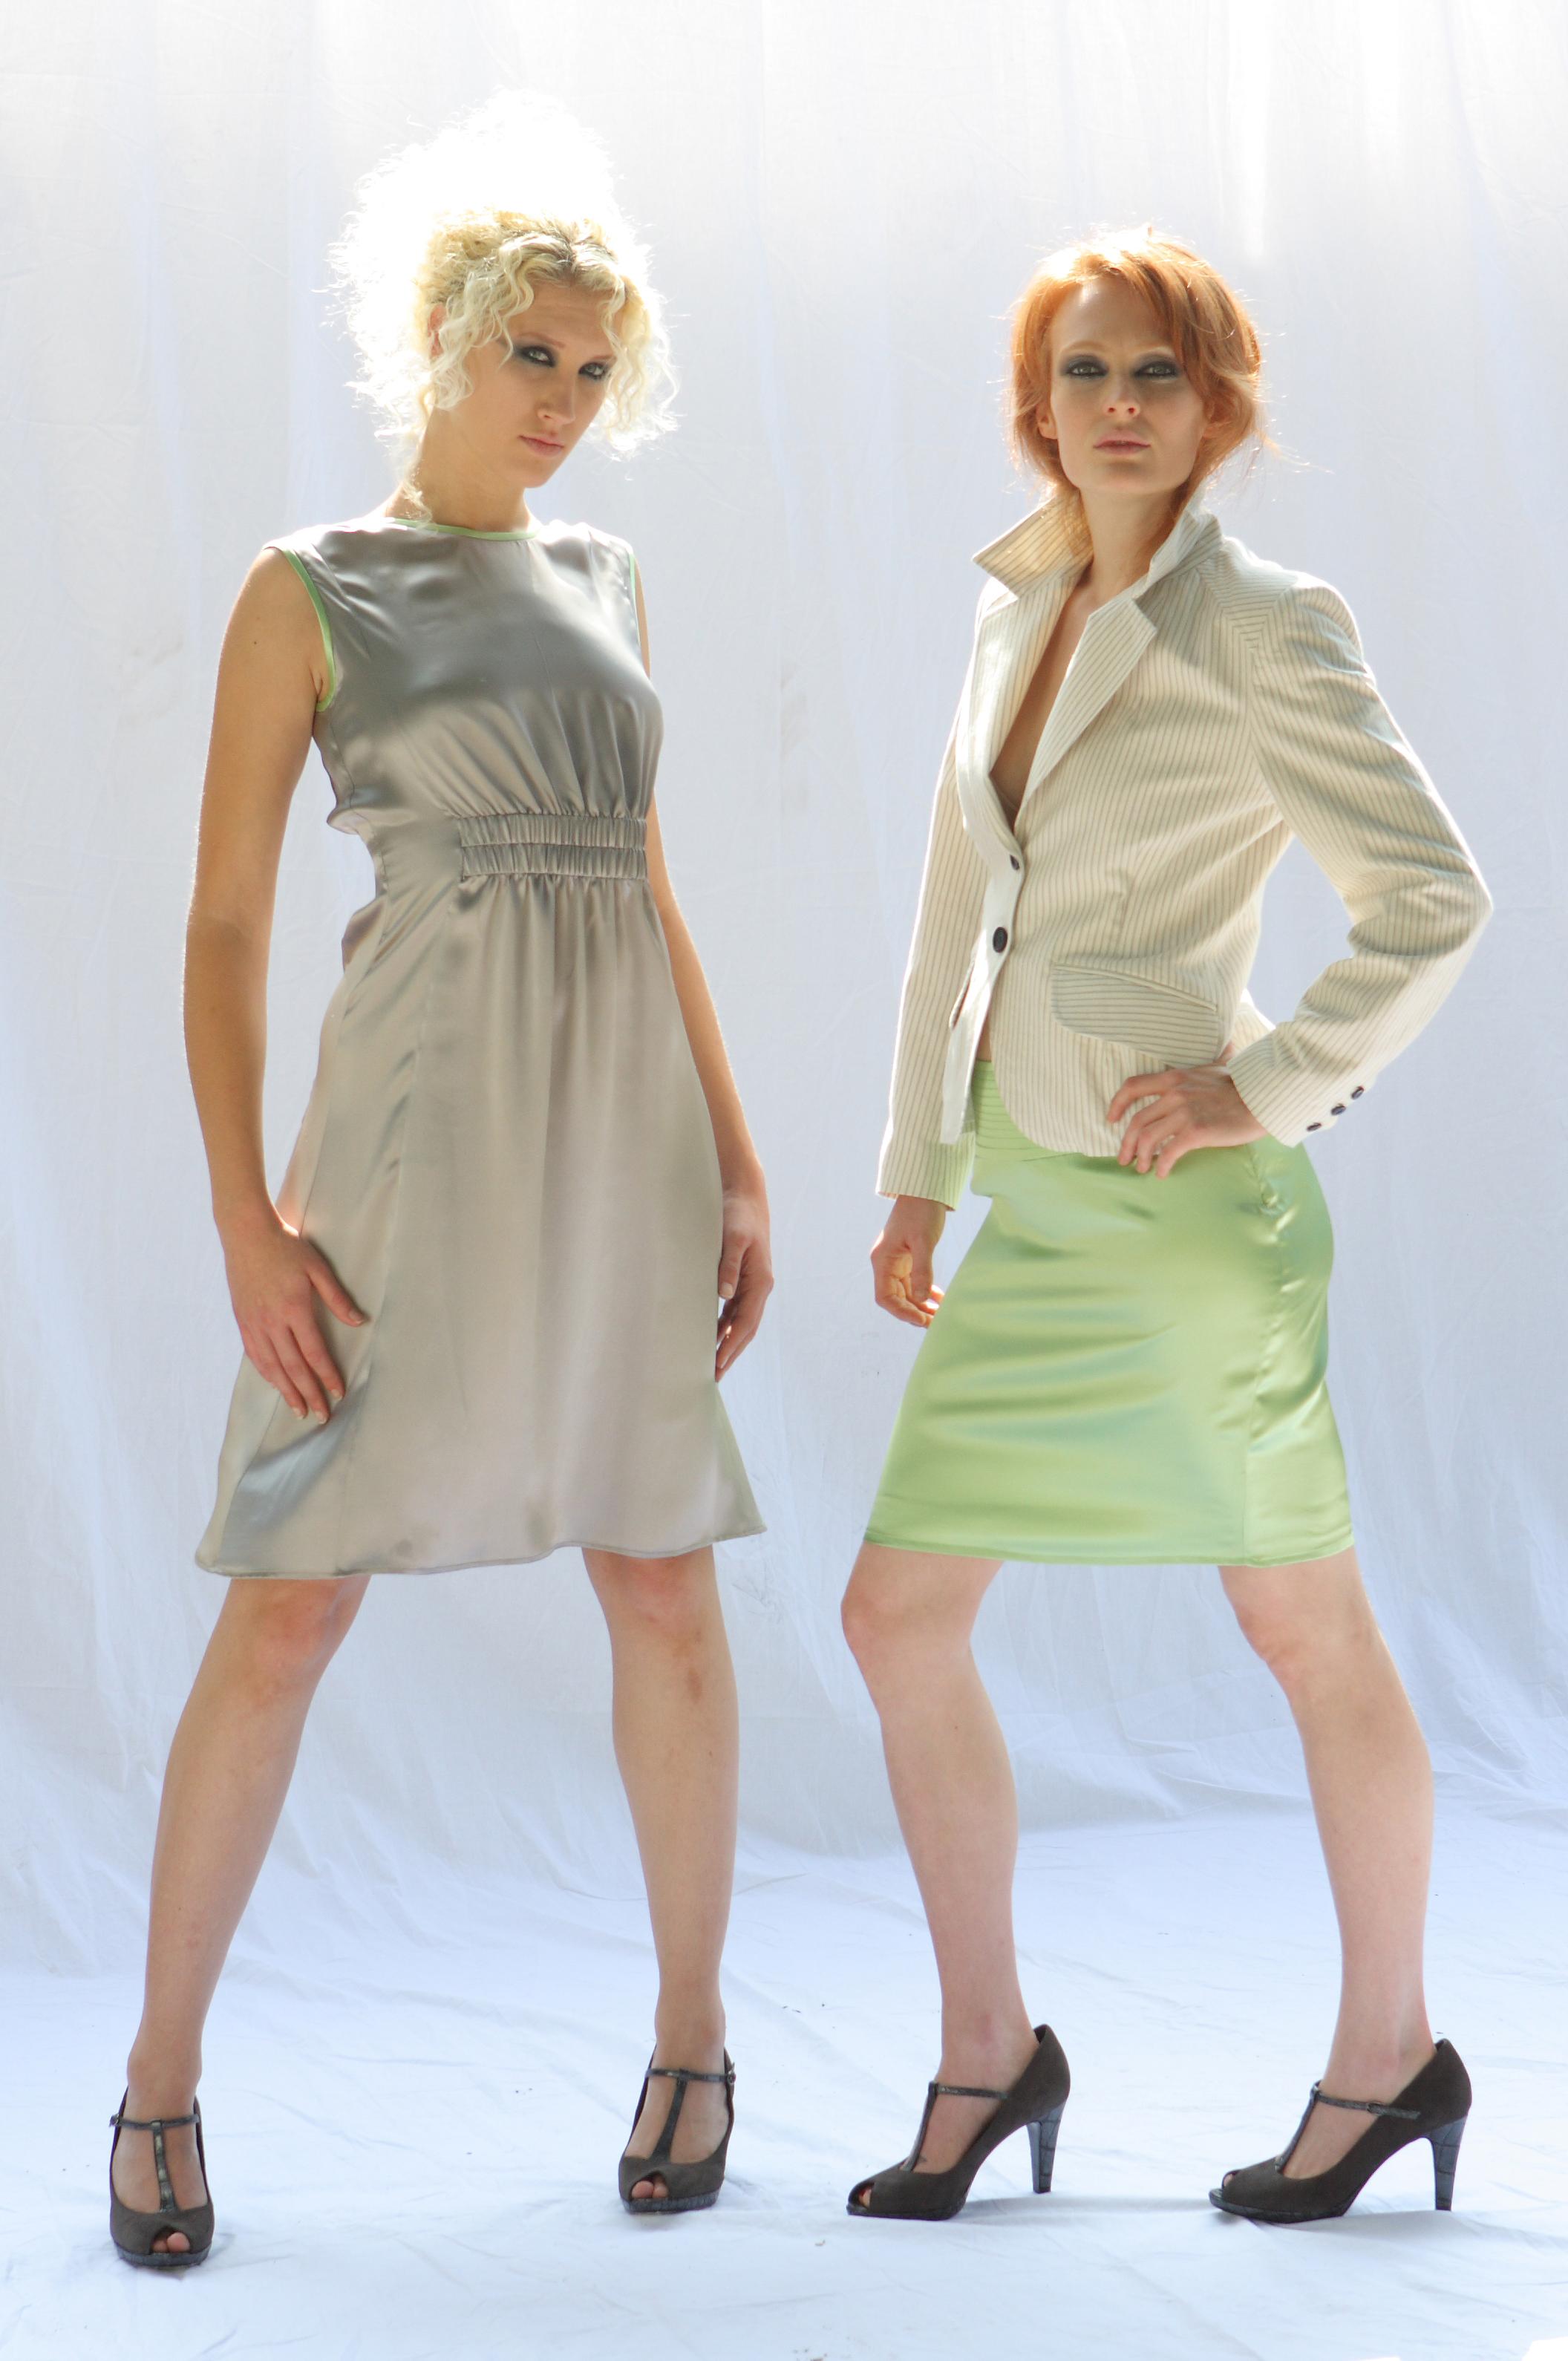 Shirred Waist Sheath Dress in Silver Silk Charmeuse.  Shrunken Blazer in Pinstriped Italian Cotton Twill.   Quilt Waist Mini Skirt in Lime Silk Charmeuse.